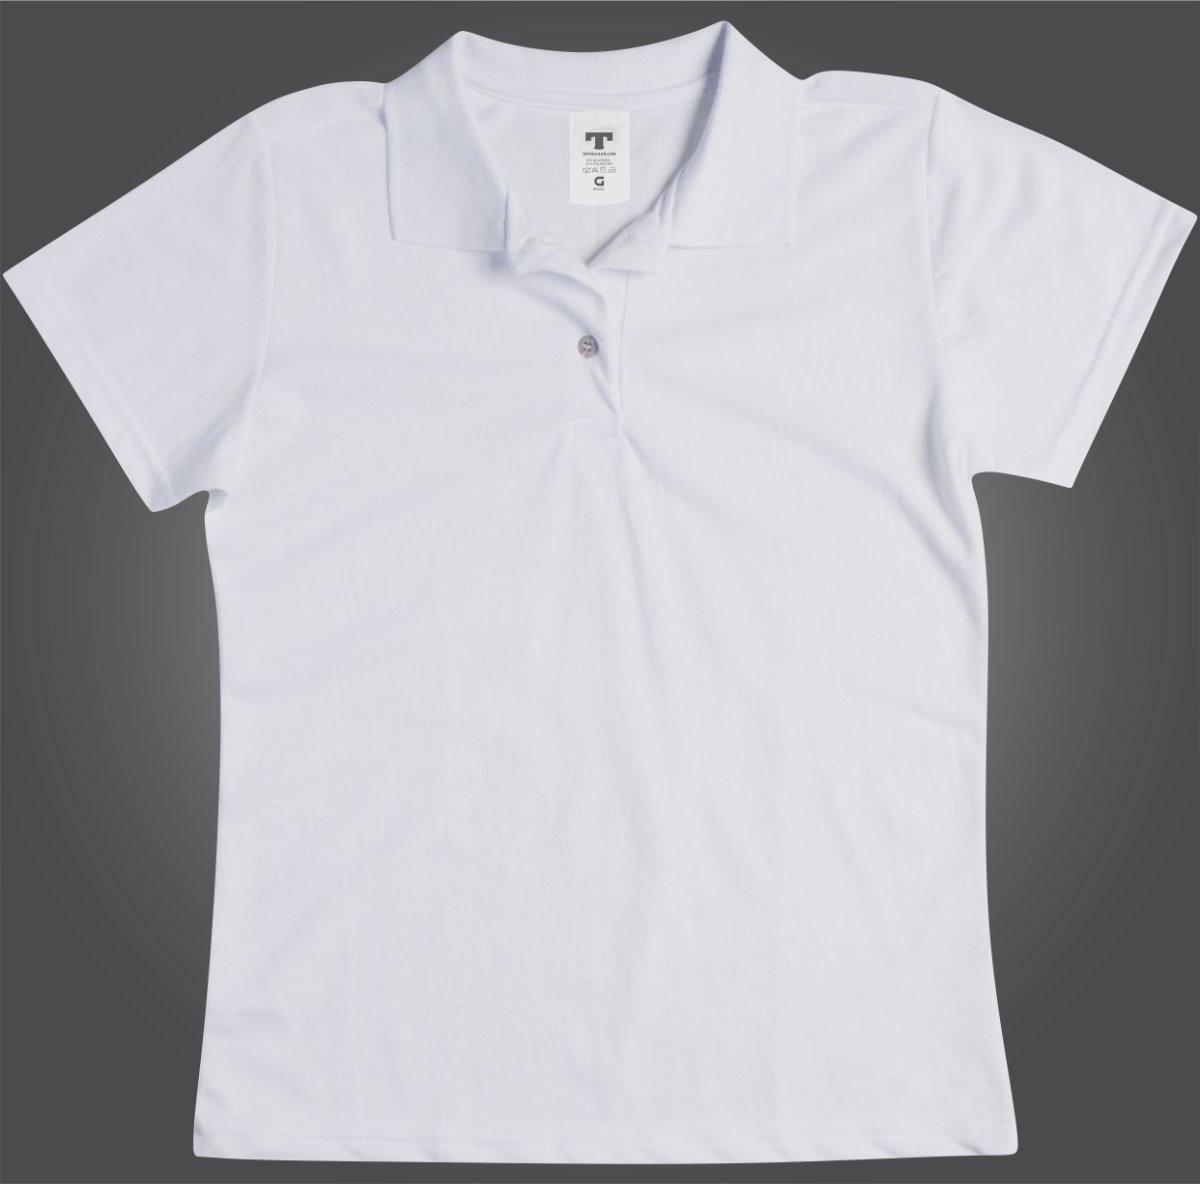 polo camisetas masculina camiseta feminino camisa uniforme. Carregando zoom. 12f0398c60125